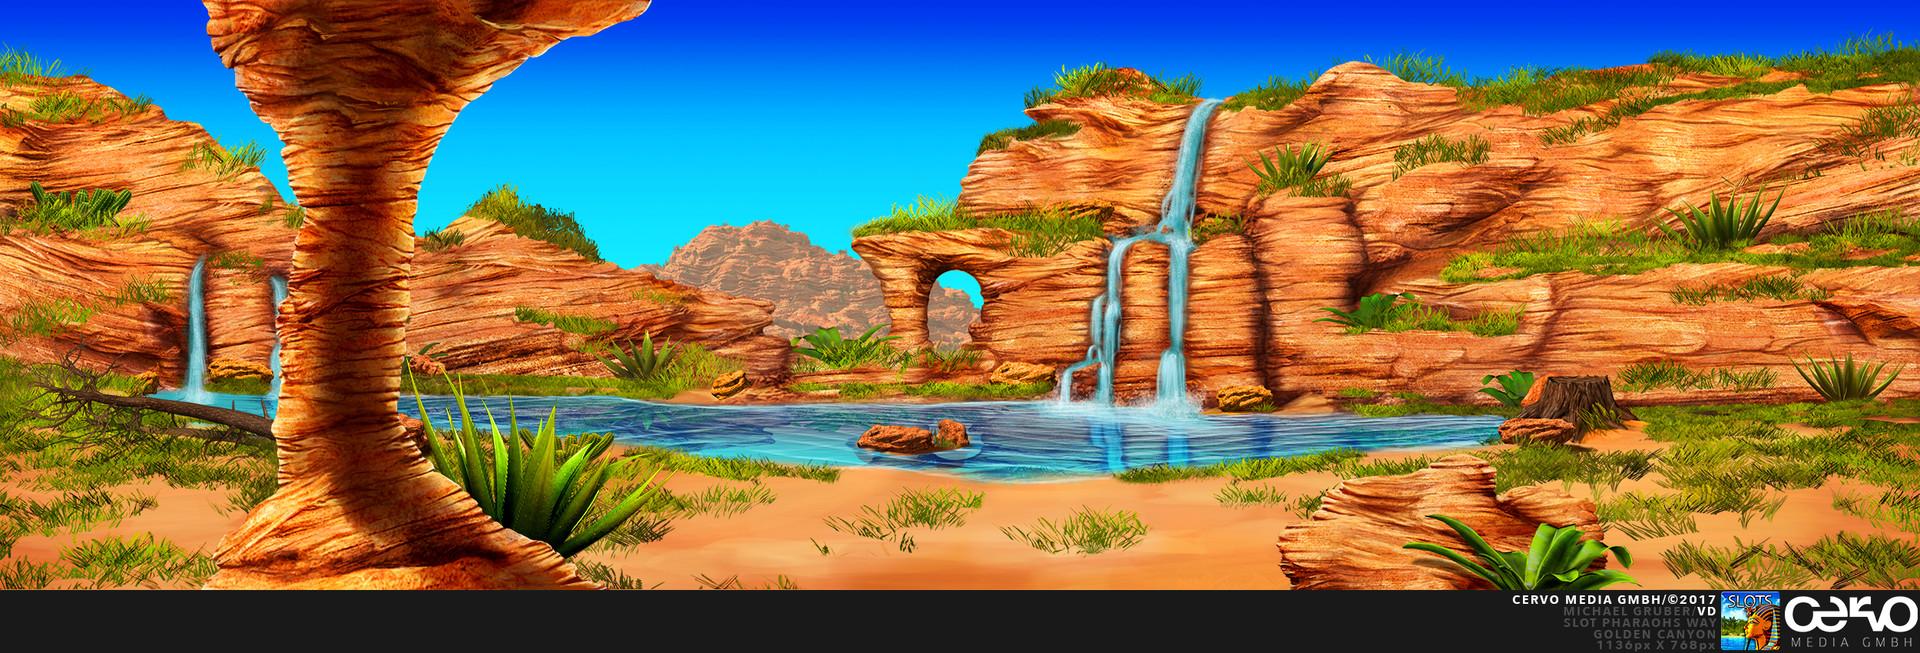 La cascade a des yeux Michael-gruber-spw-golden-canyon-v1